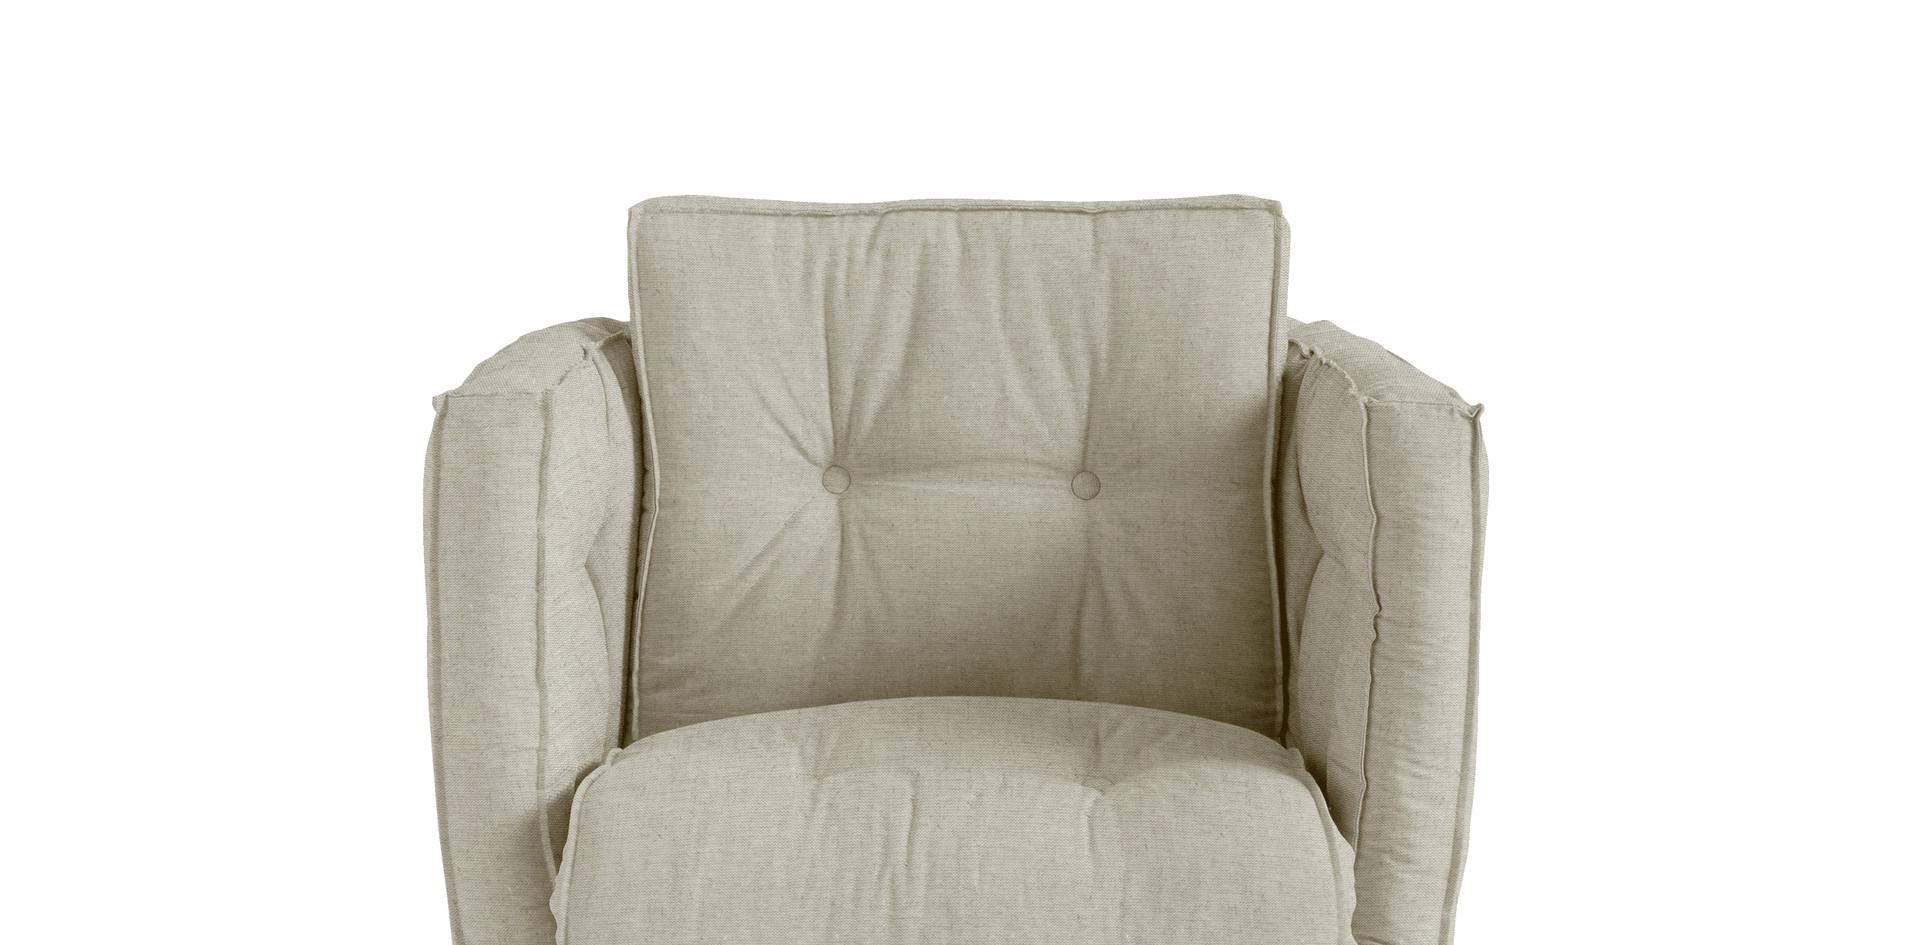 futon πολυθρόνα-κρεβάτι σε πολλά χρώματα υφάσματος